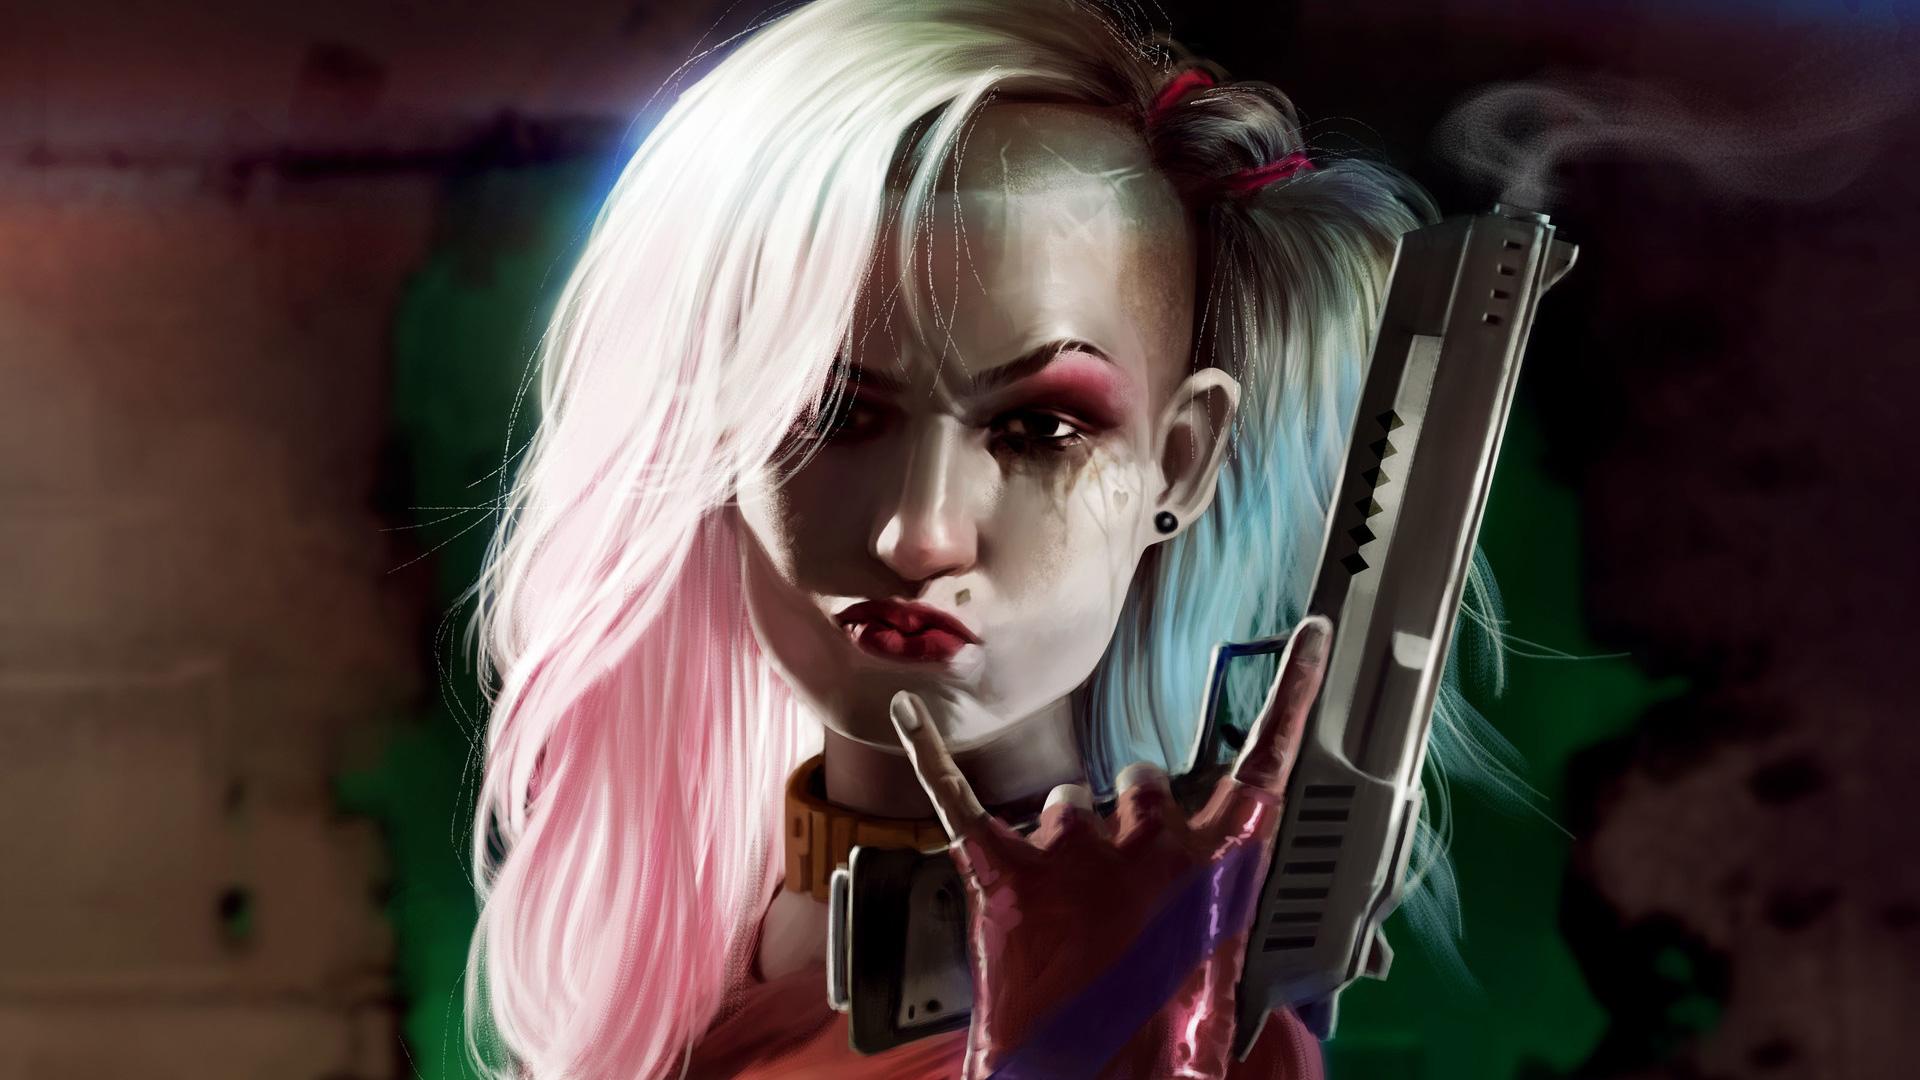 Harley Quinn Cool Gun Art  Hd Superheroes  4k Wallpapers